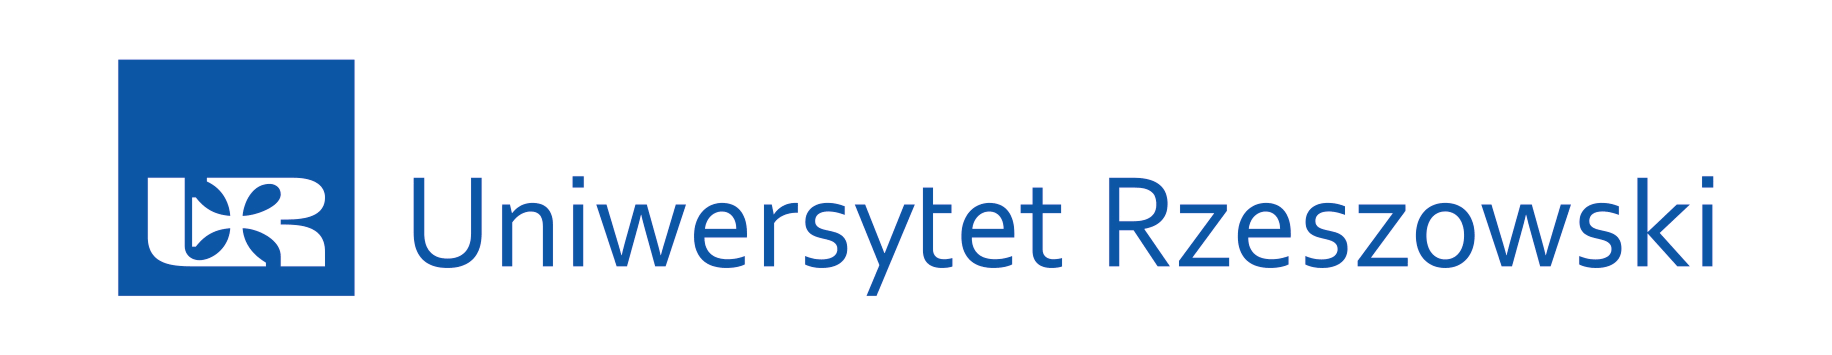 Logo Uniwersytet Rzeszowski